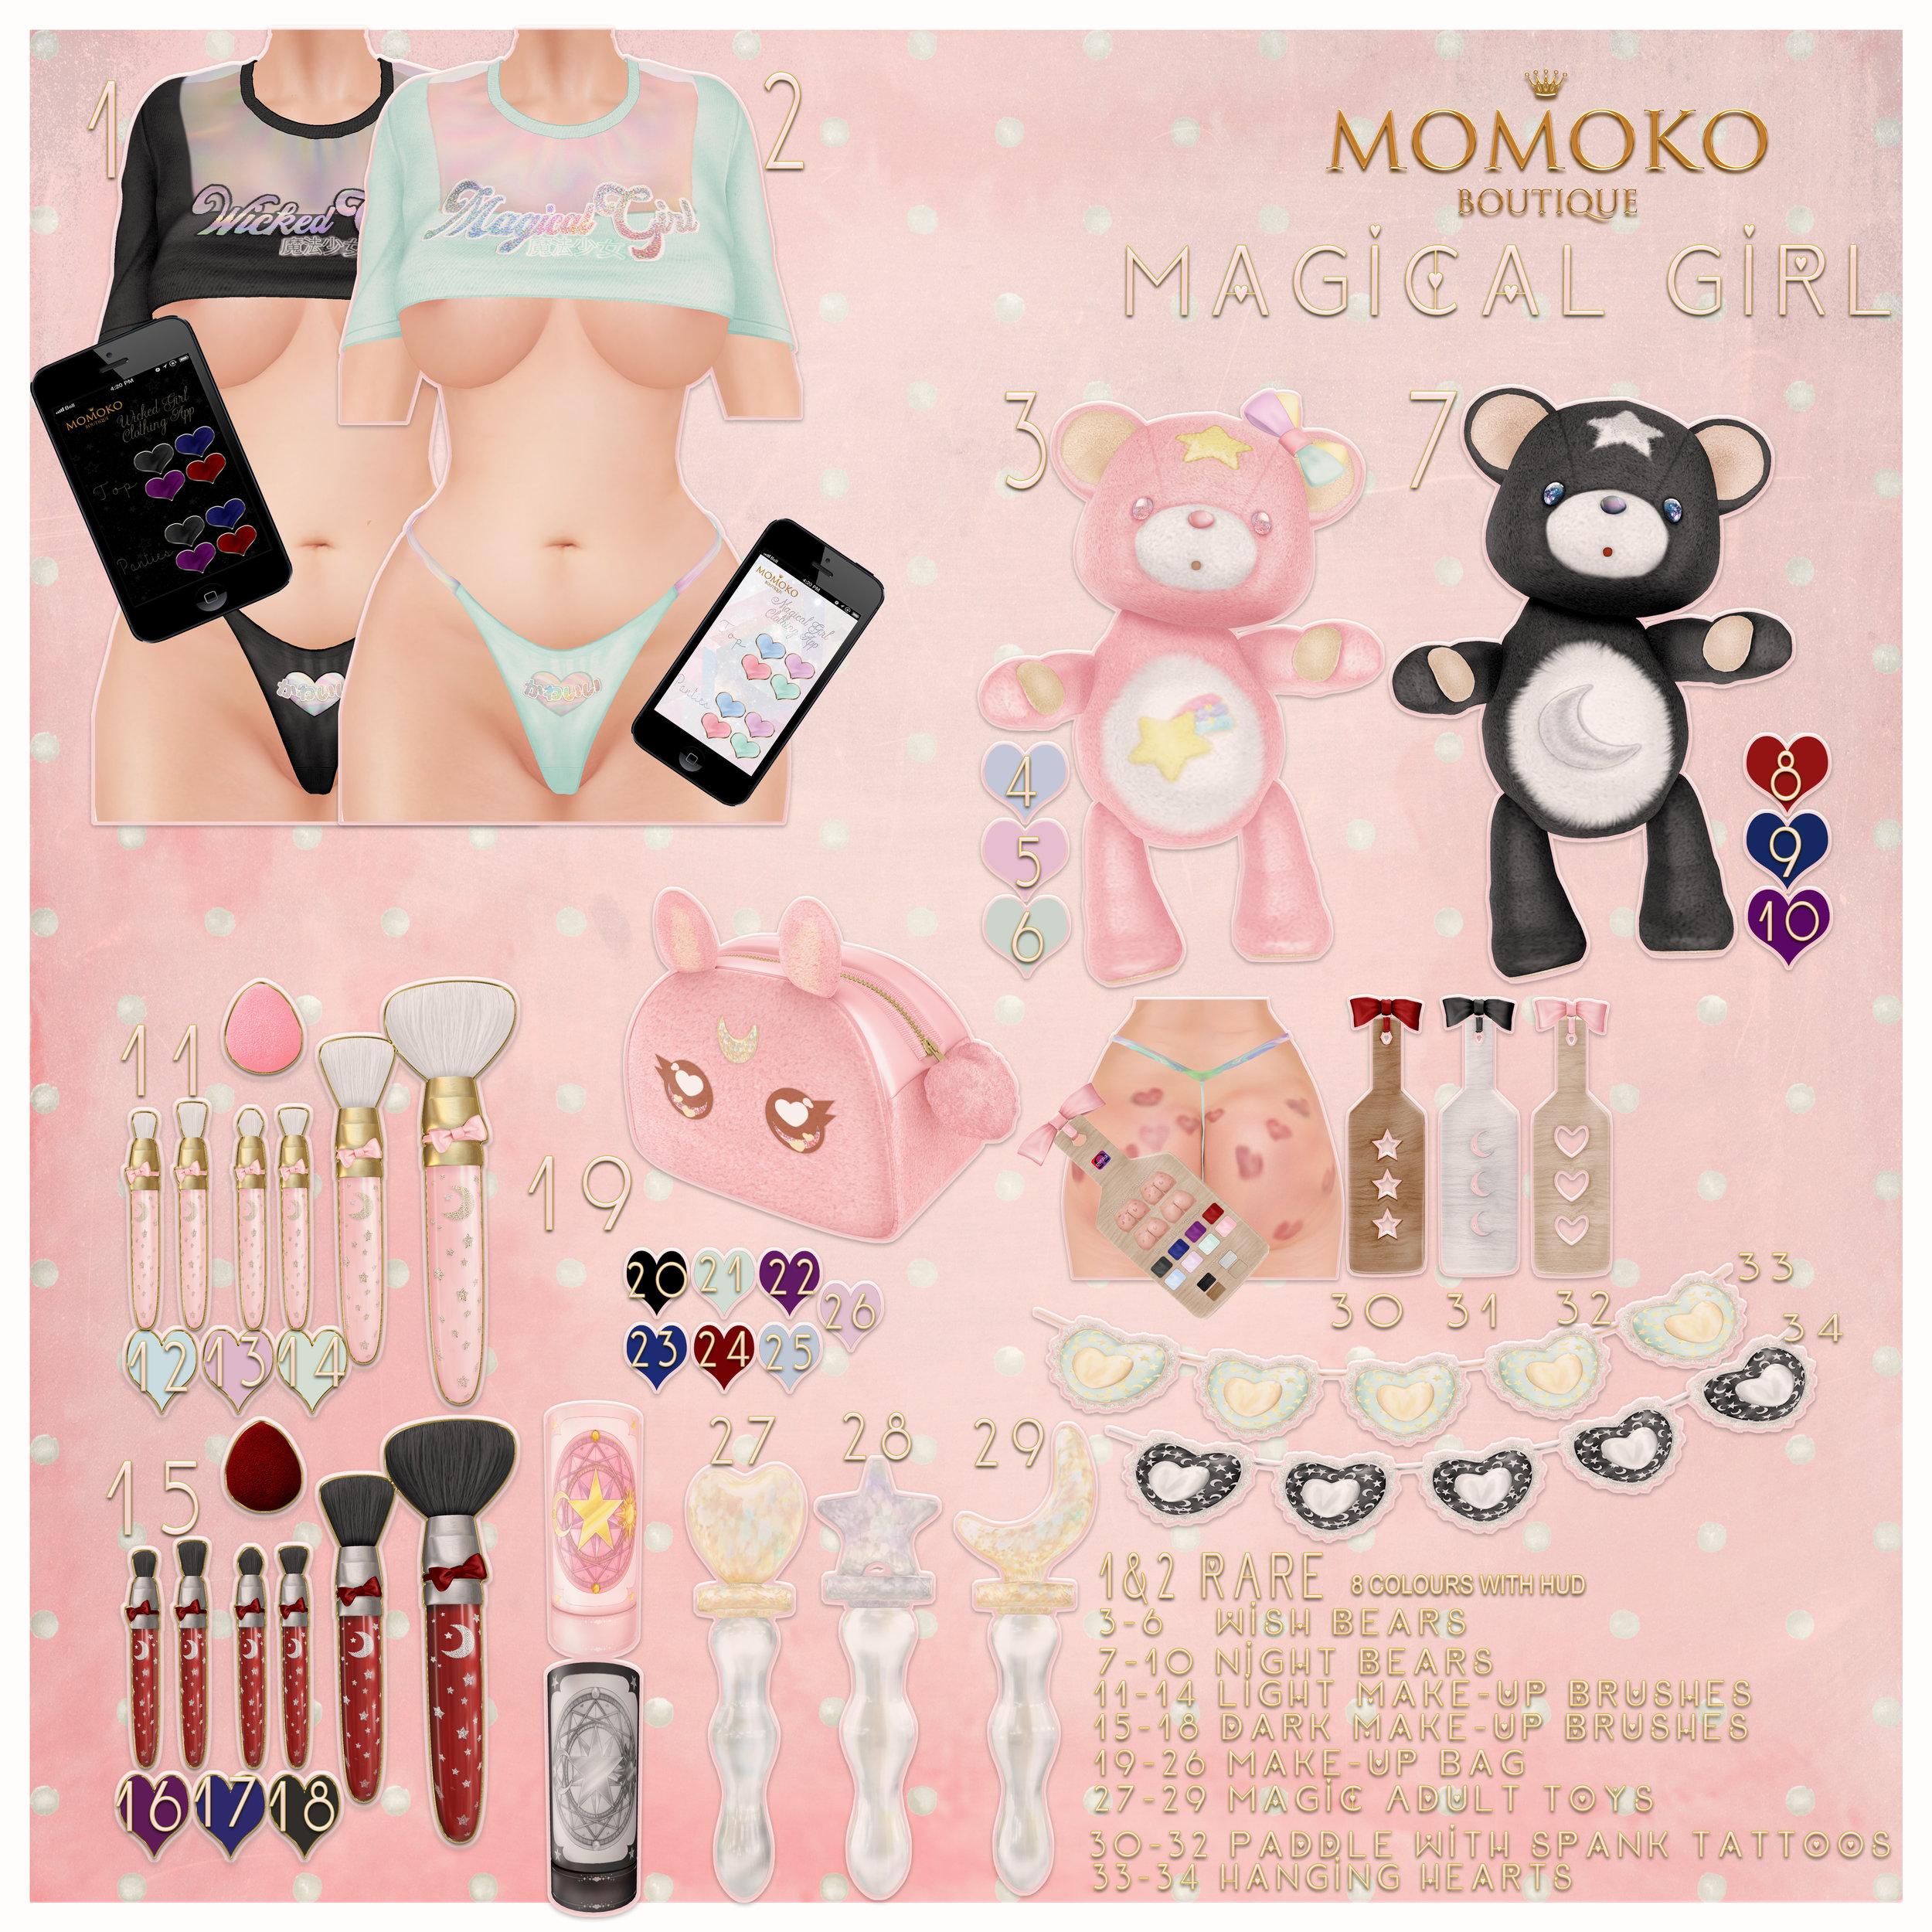 Momoko Boutique - magical girl Gacha.jpg